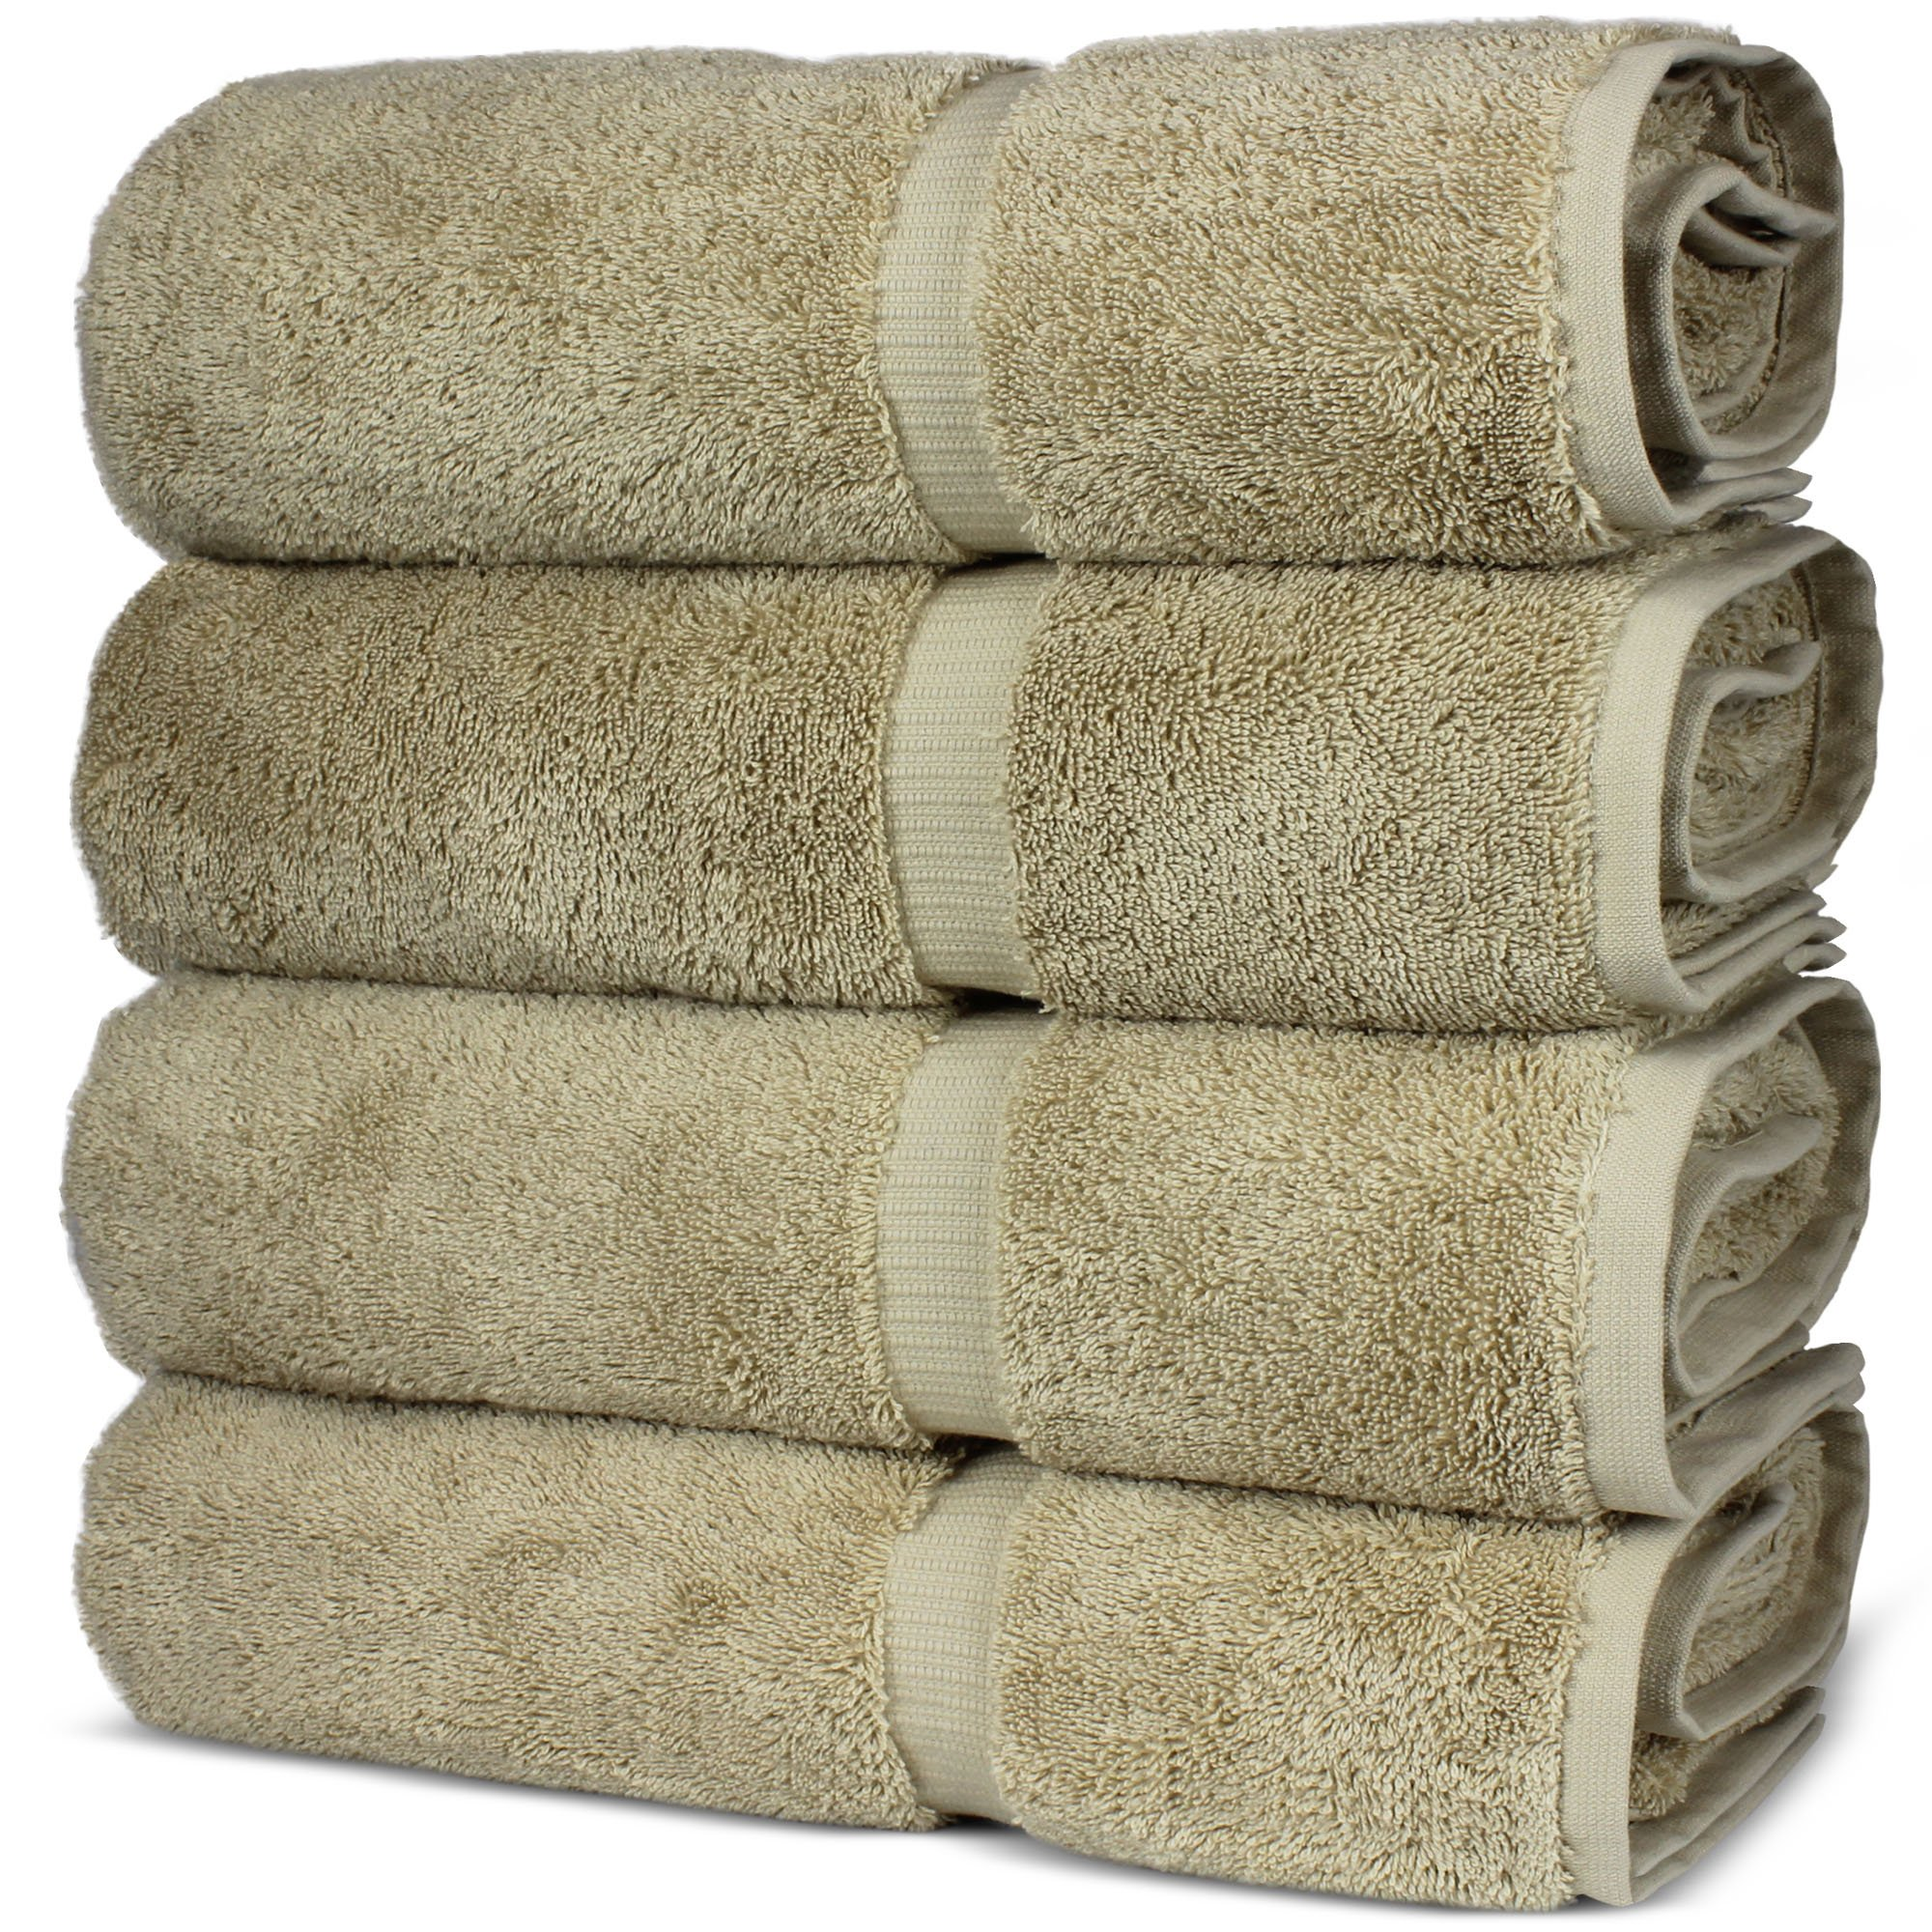 Luxury Premium long-stable Hotel & Spa Turkish Cotton 4-Piece Eco-Friendly Bath Towel Set (Driftwood) by Chakir Turkish Linens (Image #4)